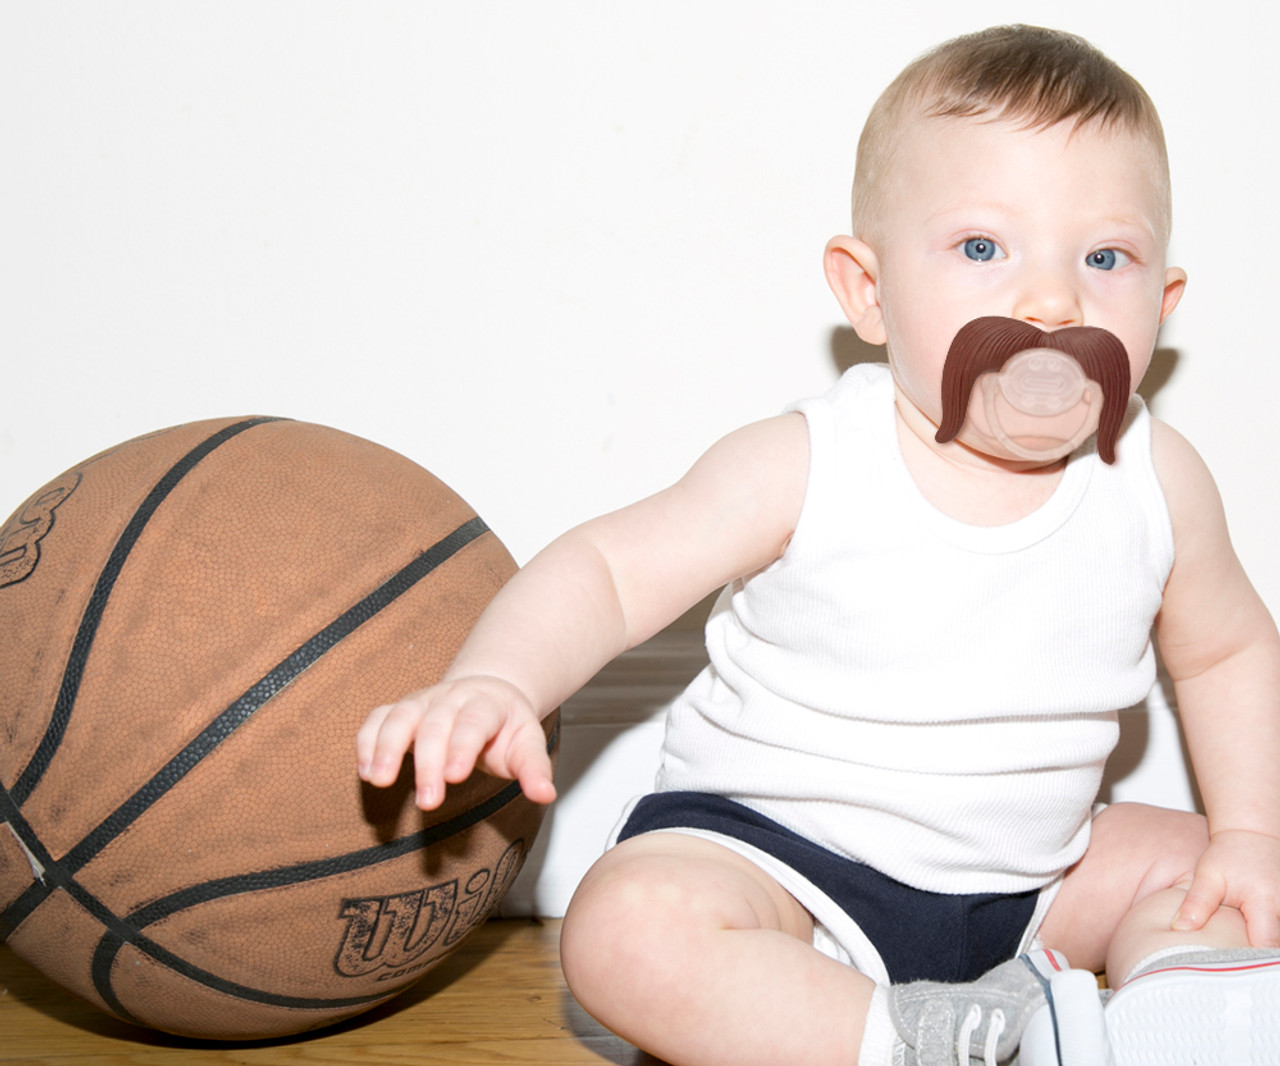 Mustachifier Mustache Pacifier Binkie Man Plug Funny Baby Silicone BPA Free